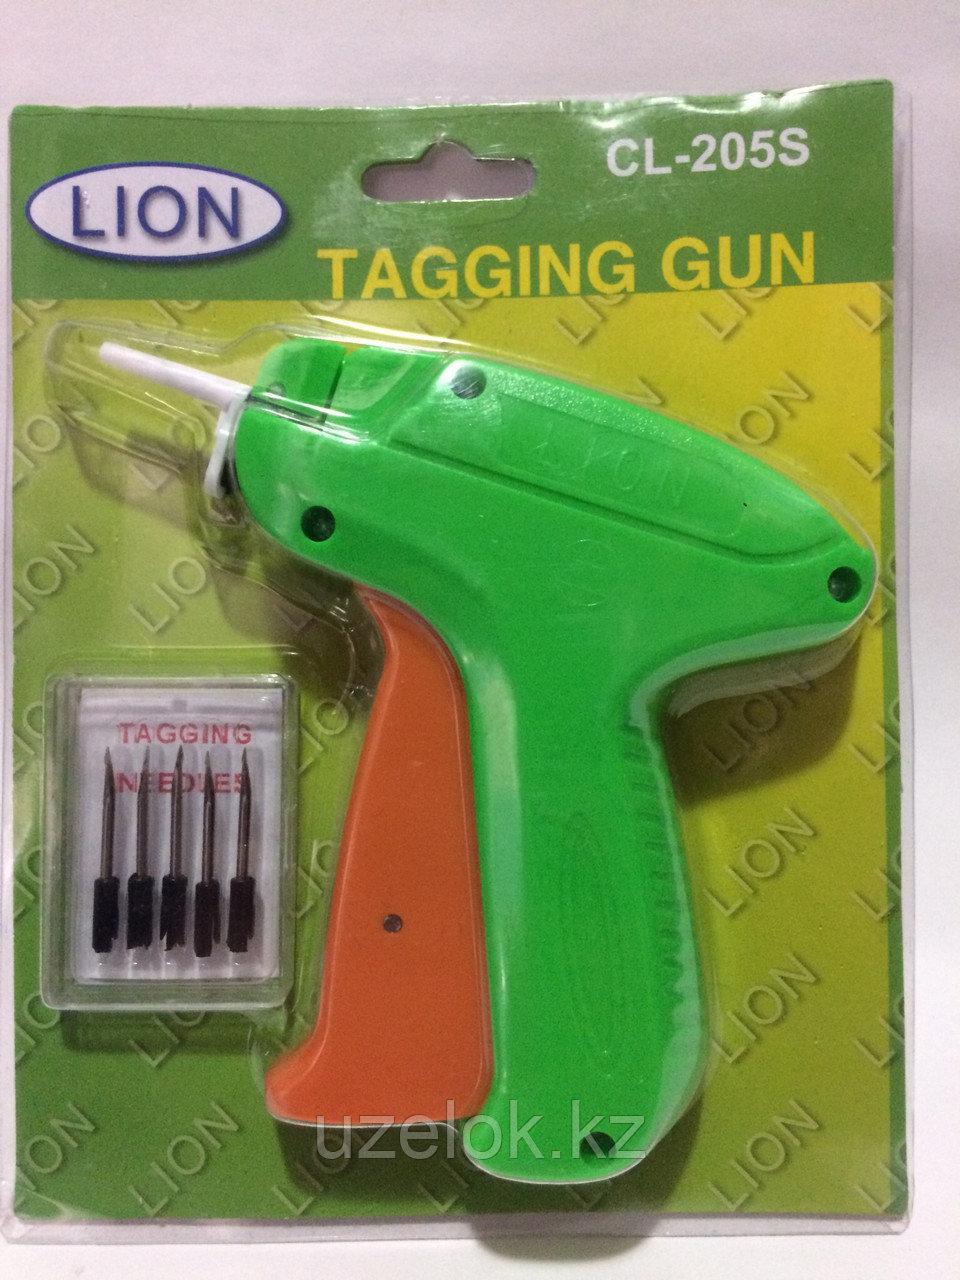 Пистолет для бирки.